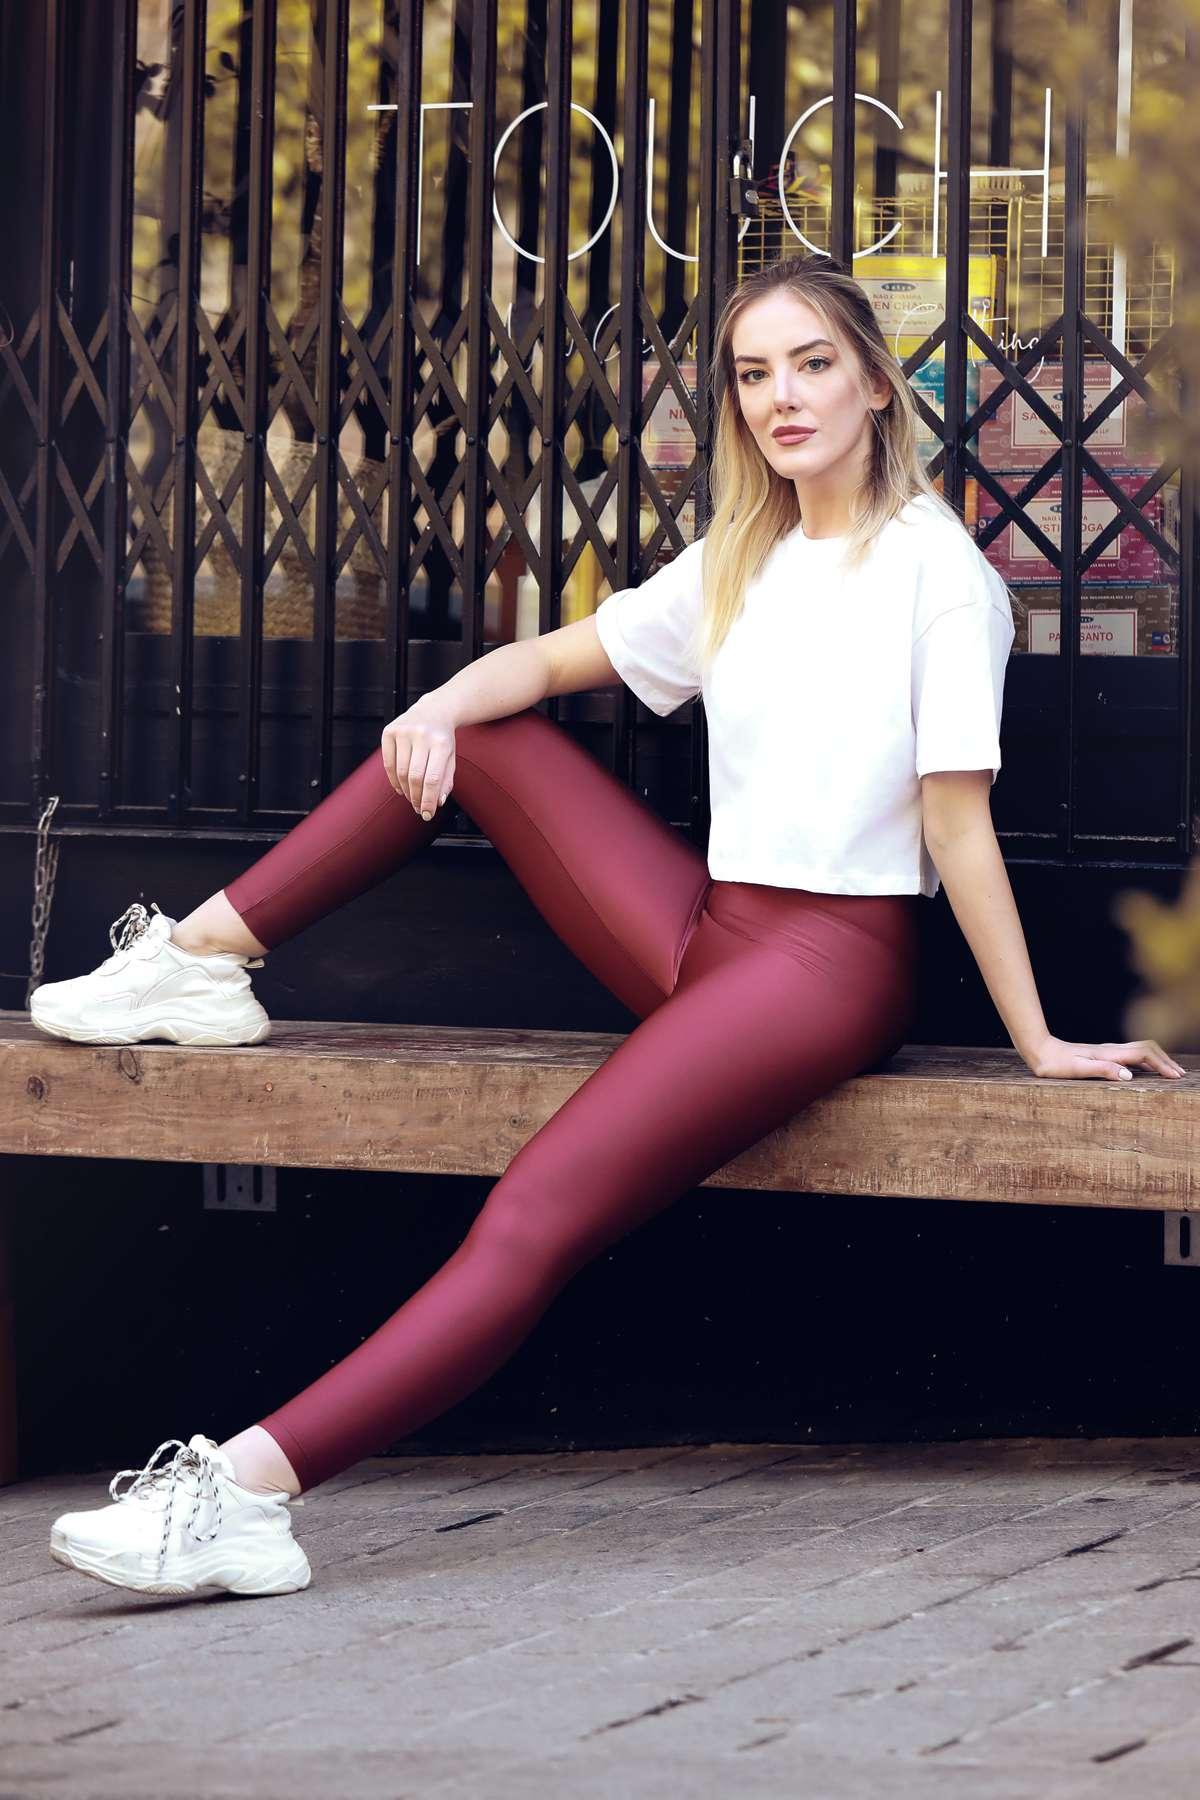 PYRO Women's Legging 4-way Stretch Fabric High Waist Slim Belt Knee-Free and Non-see-Through Fabric Custom Made for Yoga Fitness